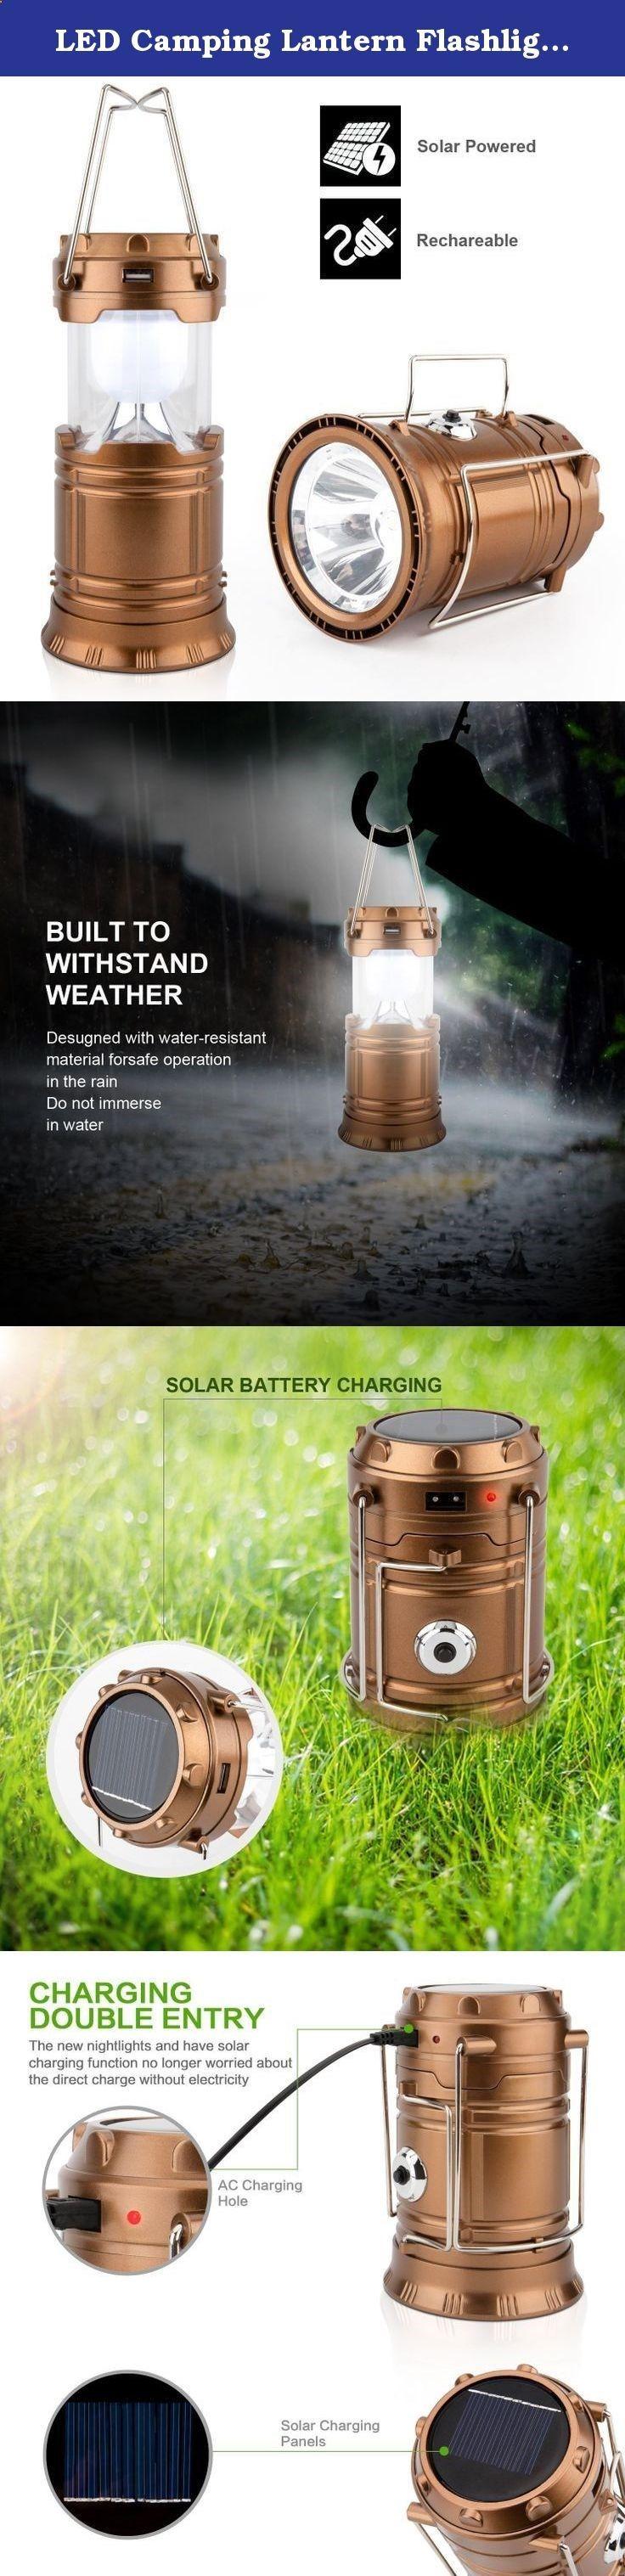 Jerry chair backpacking - Led Camping Lantern Flashlights Hurricane Emergency Tent Light Backpacking Hiking Fishing